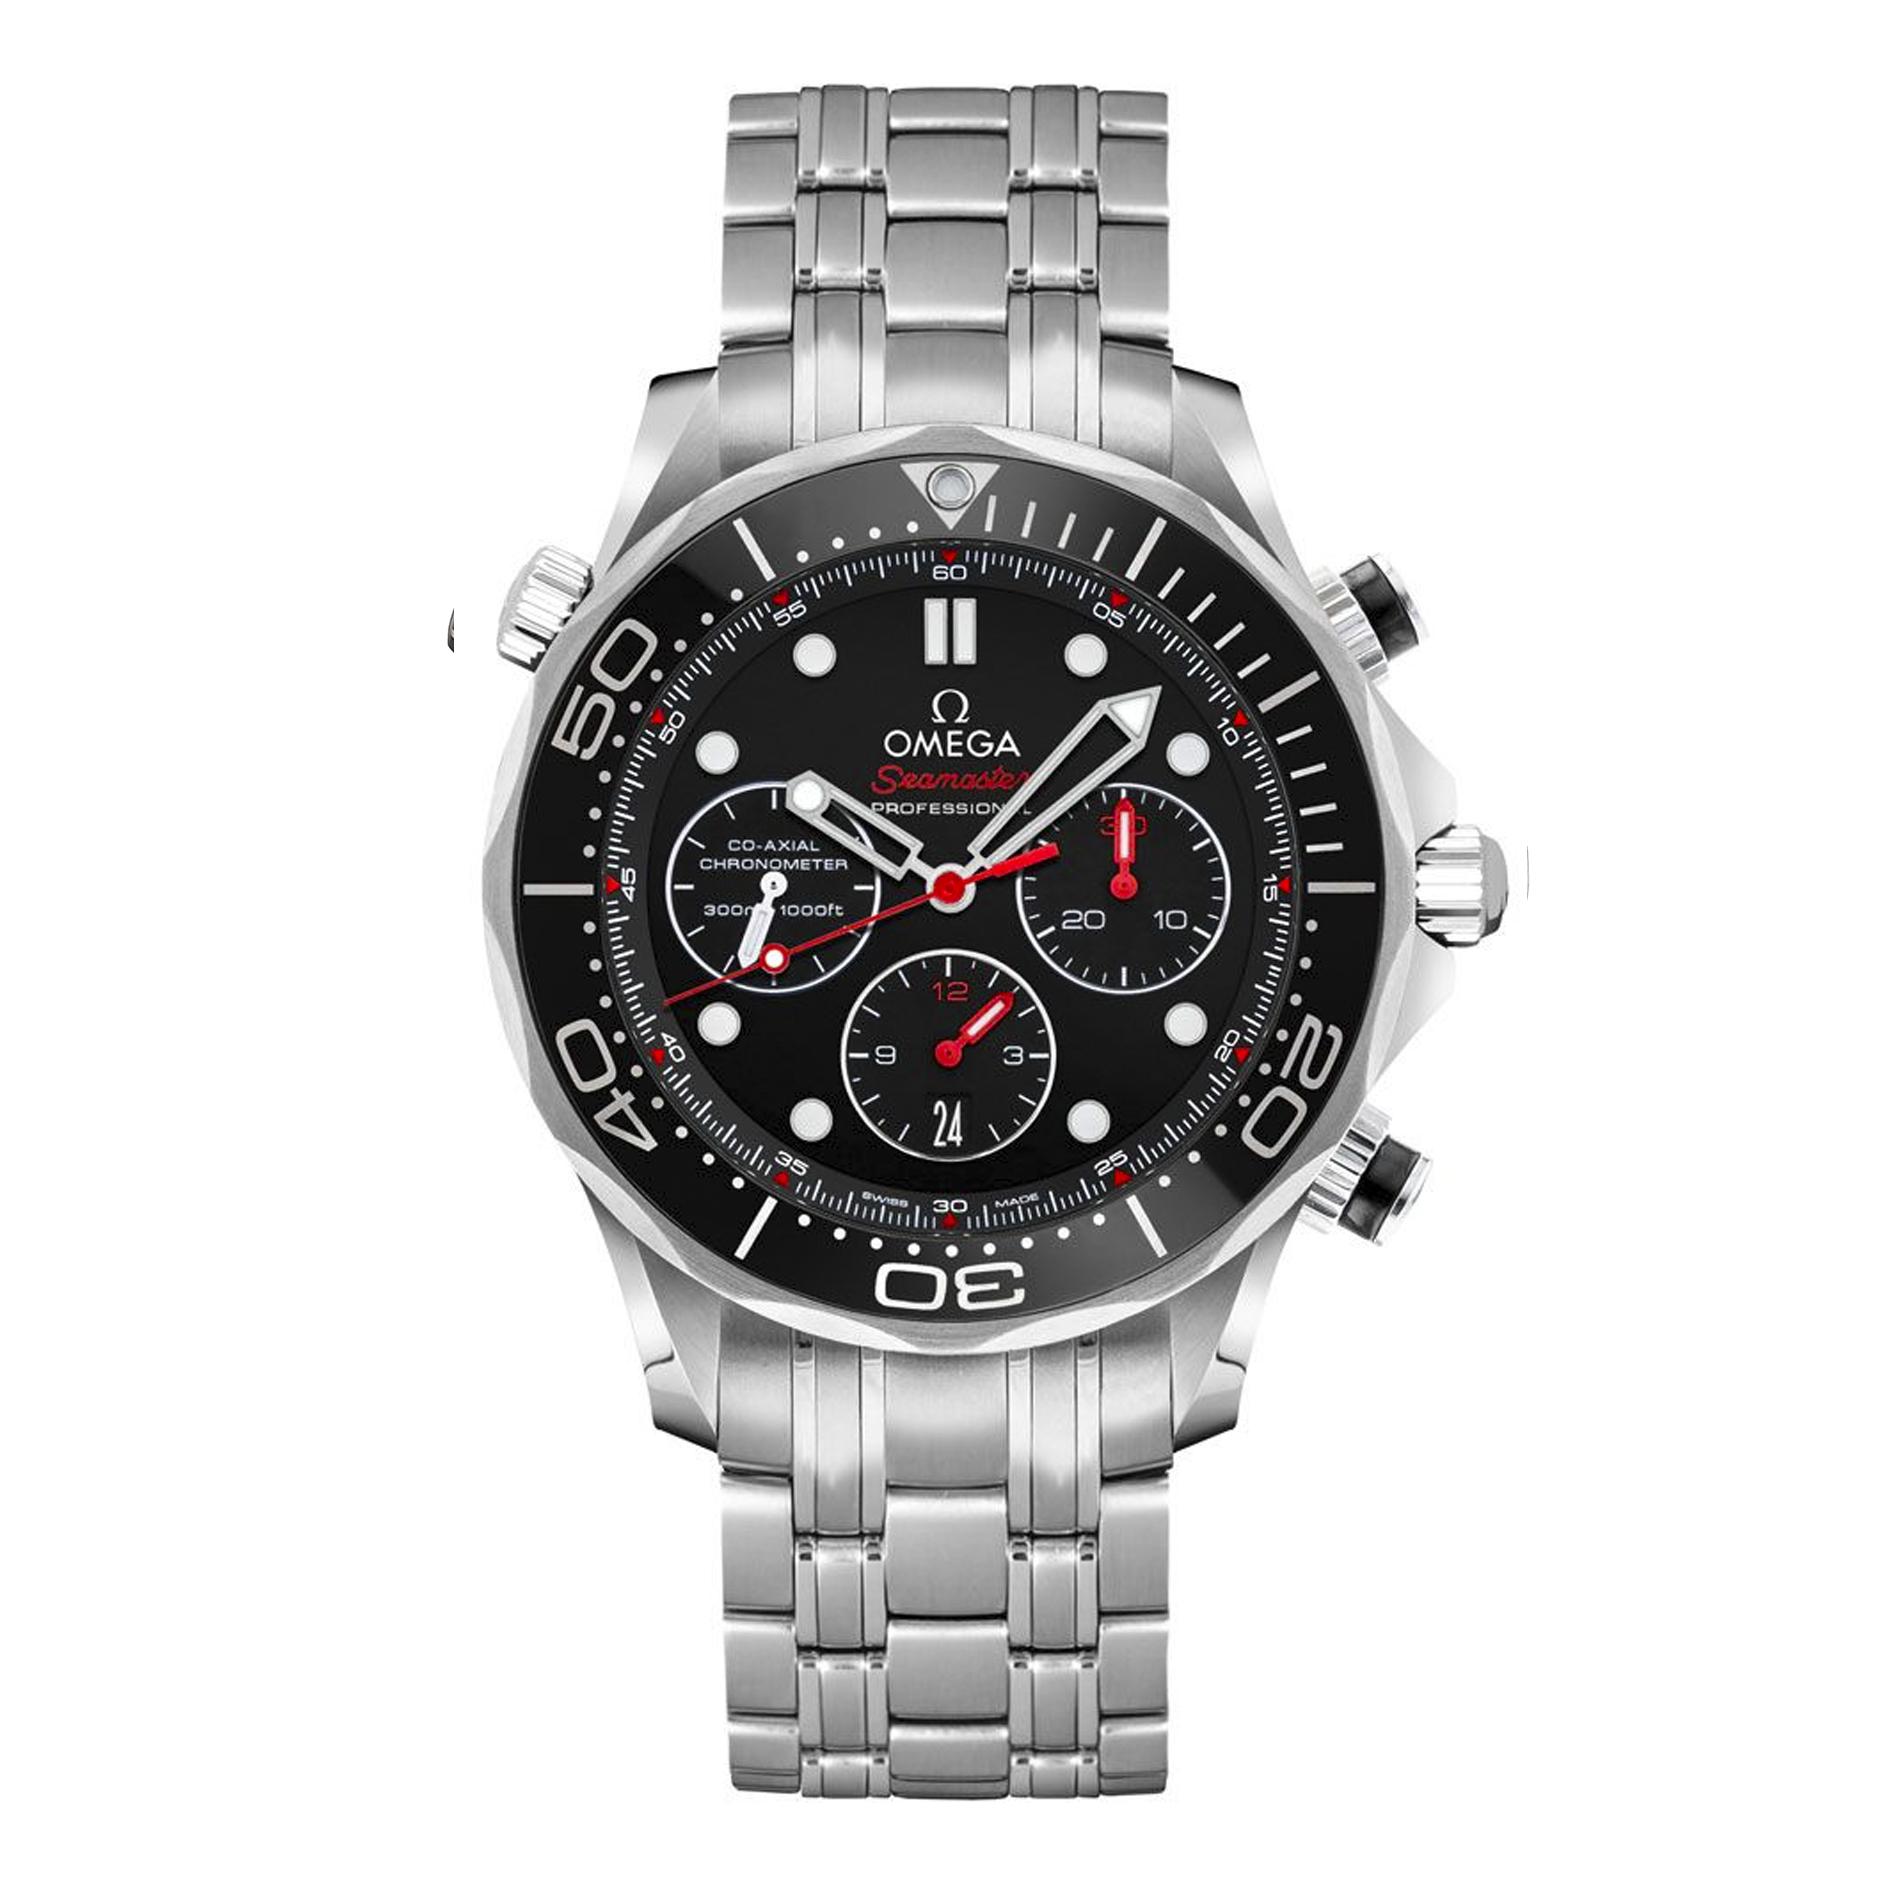 Reloj Omega – Diver 300M CoAxial Chronograph 41,5 - Amaya Joyeros